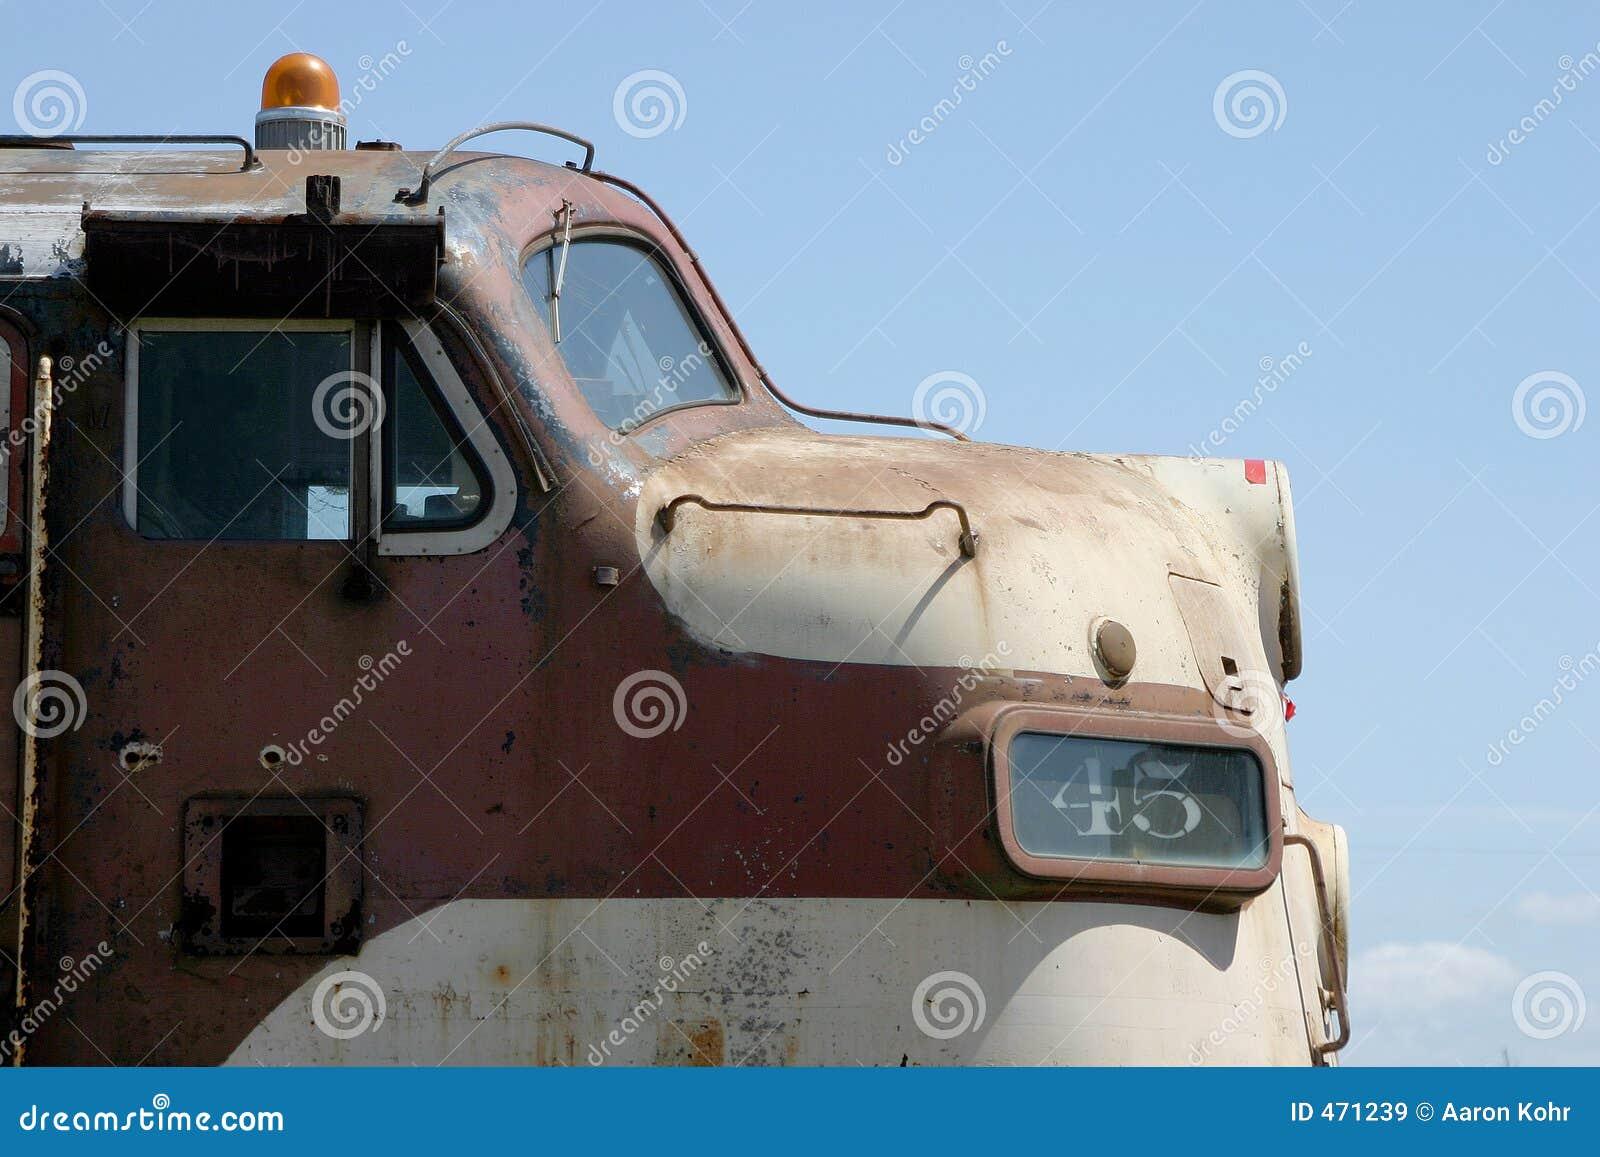 Download Old Locomotive stock image. Image of rust, rail, tracks - 471239